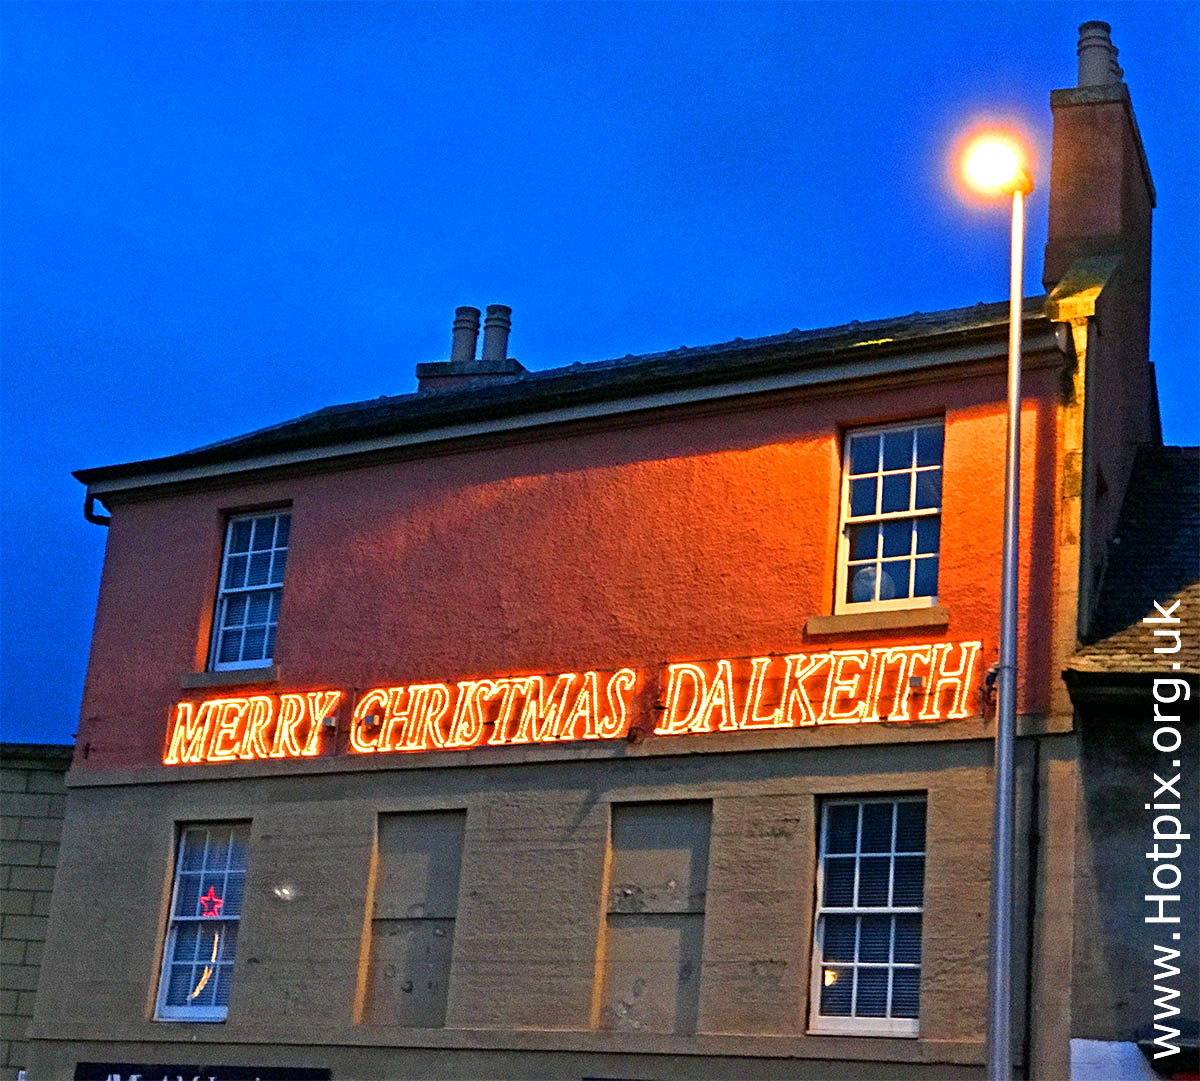 HousingITguy,Project365,2nd 365,HotpixUK365,Tone Smith,GoTonySmith,365,2365,one a day,Tony Smith,Hotpix,Happy Christmas Dalkeith,Dalkeith,Midlothian,dusk,sign,Christmas,decorations,Christmas Decorations